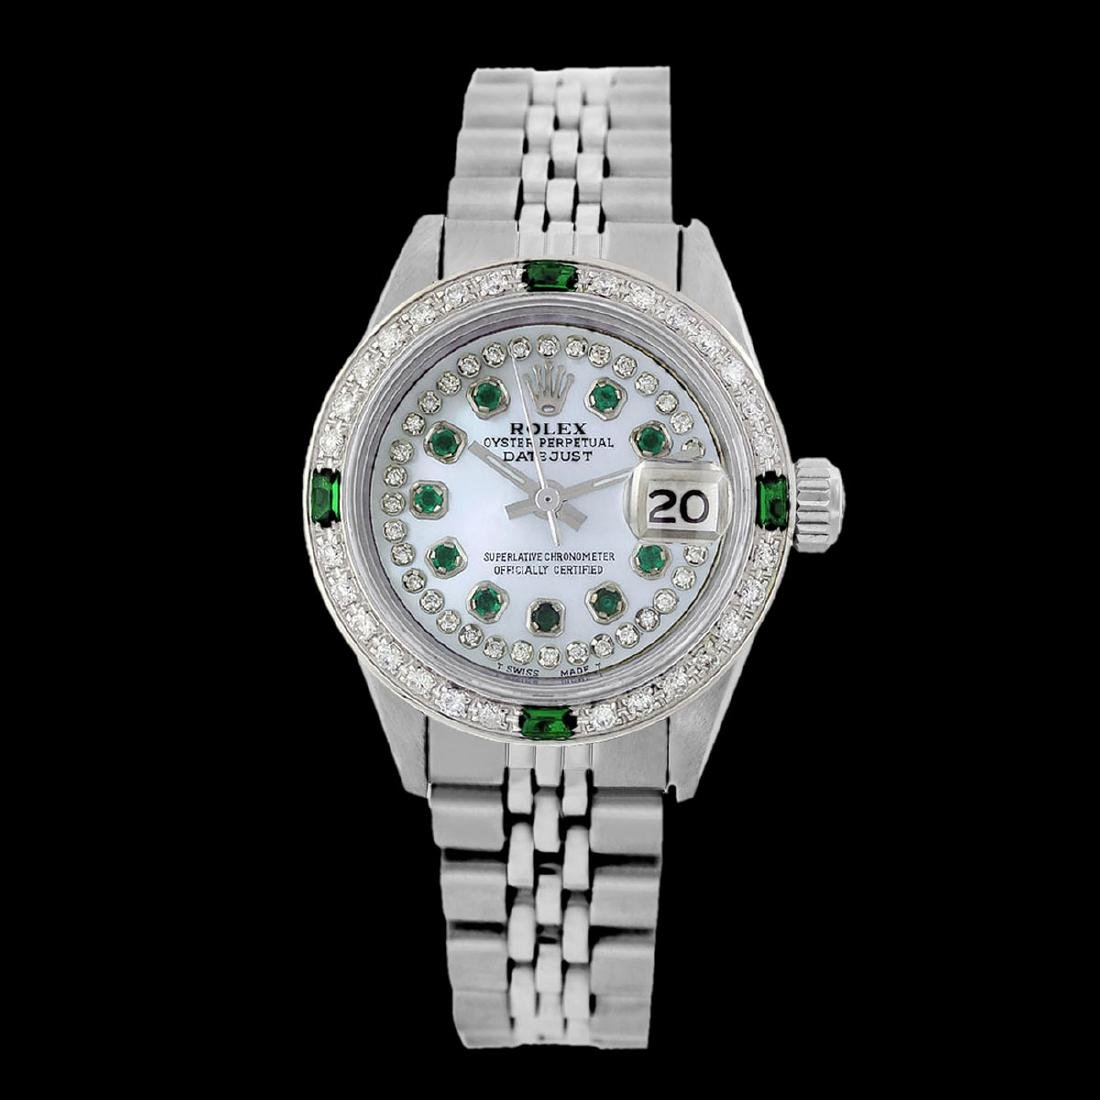 Rolex Men's Stainless Steel, QuickSet, Diam/Emerald - 2